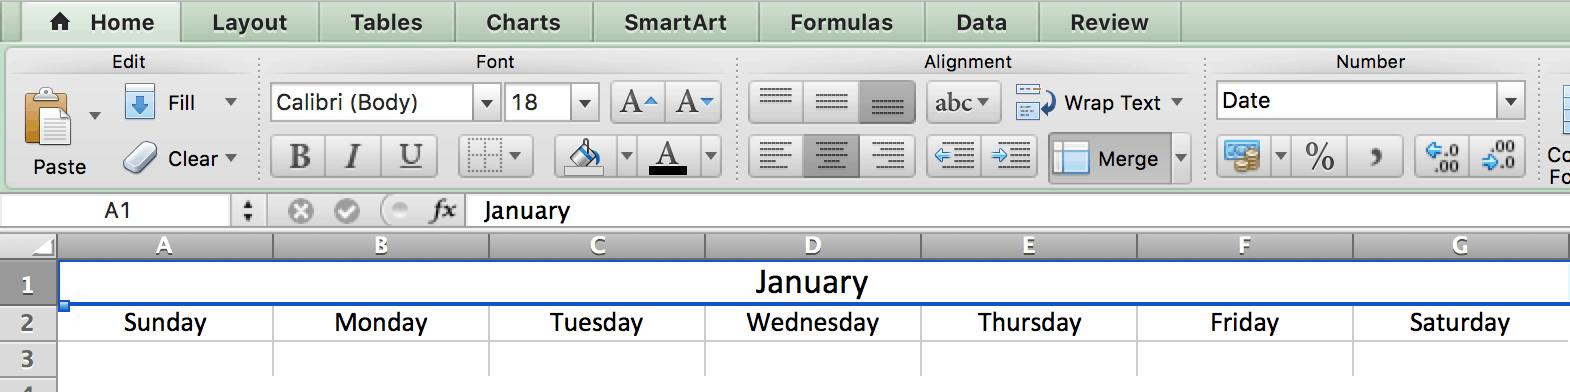 merge center calendar excelpng